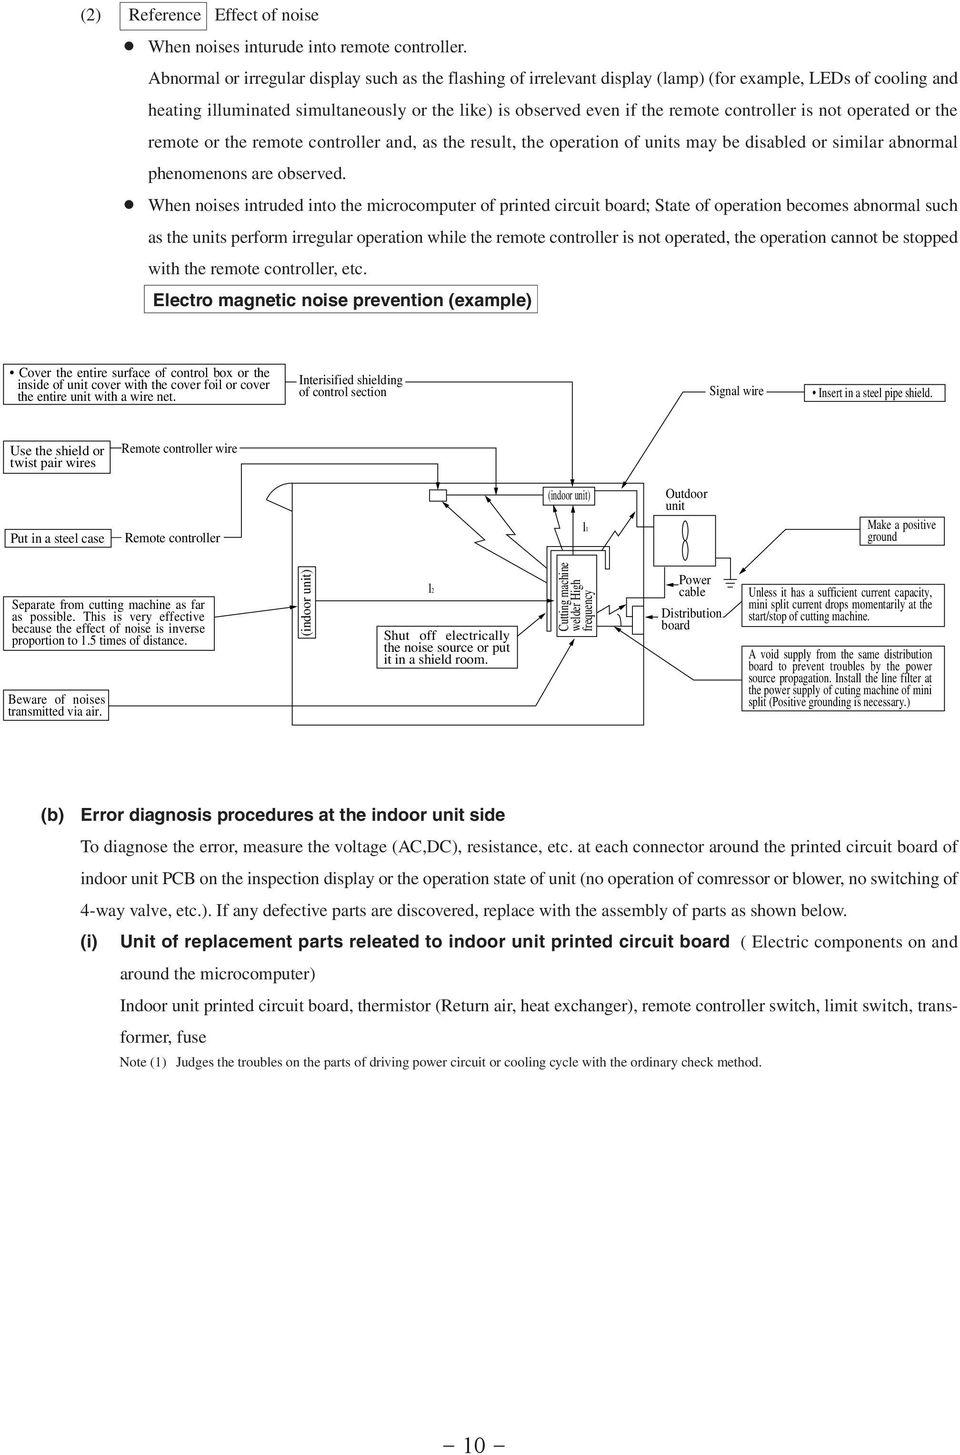 medium resolution of controller is not operated or the remote or the remote controller and as the result